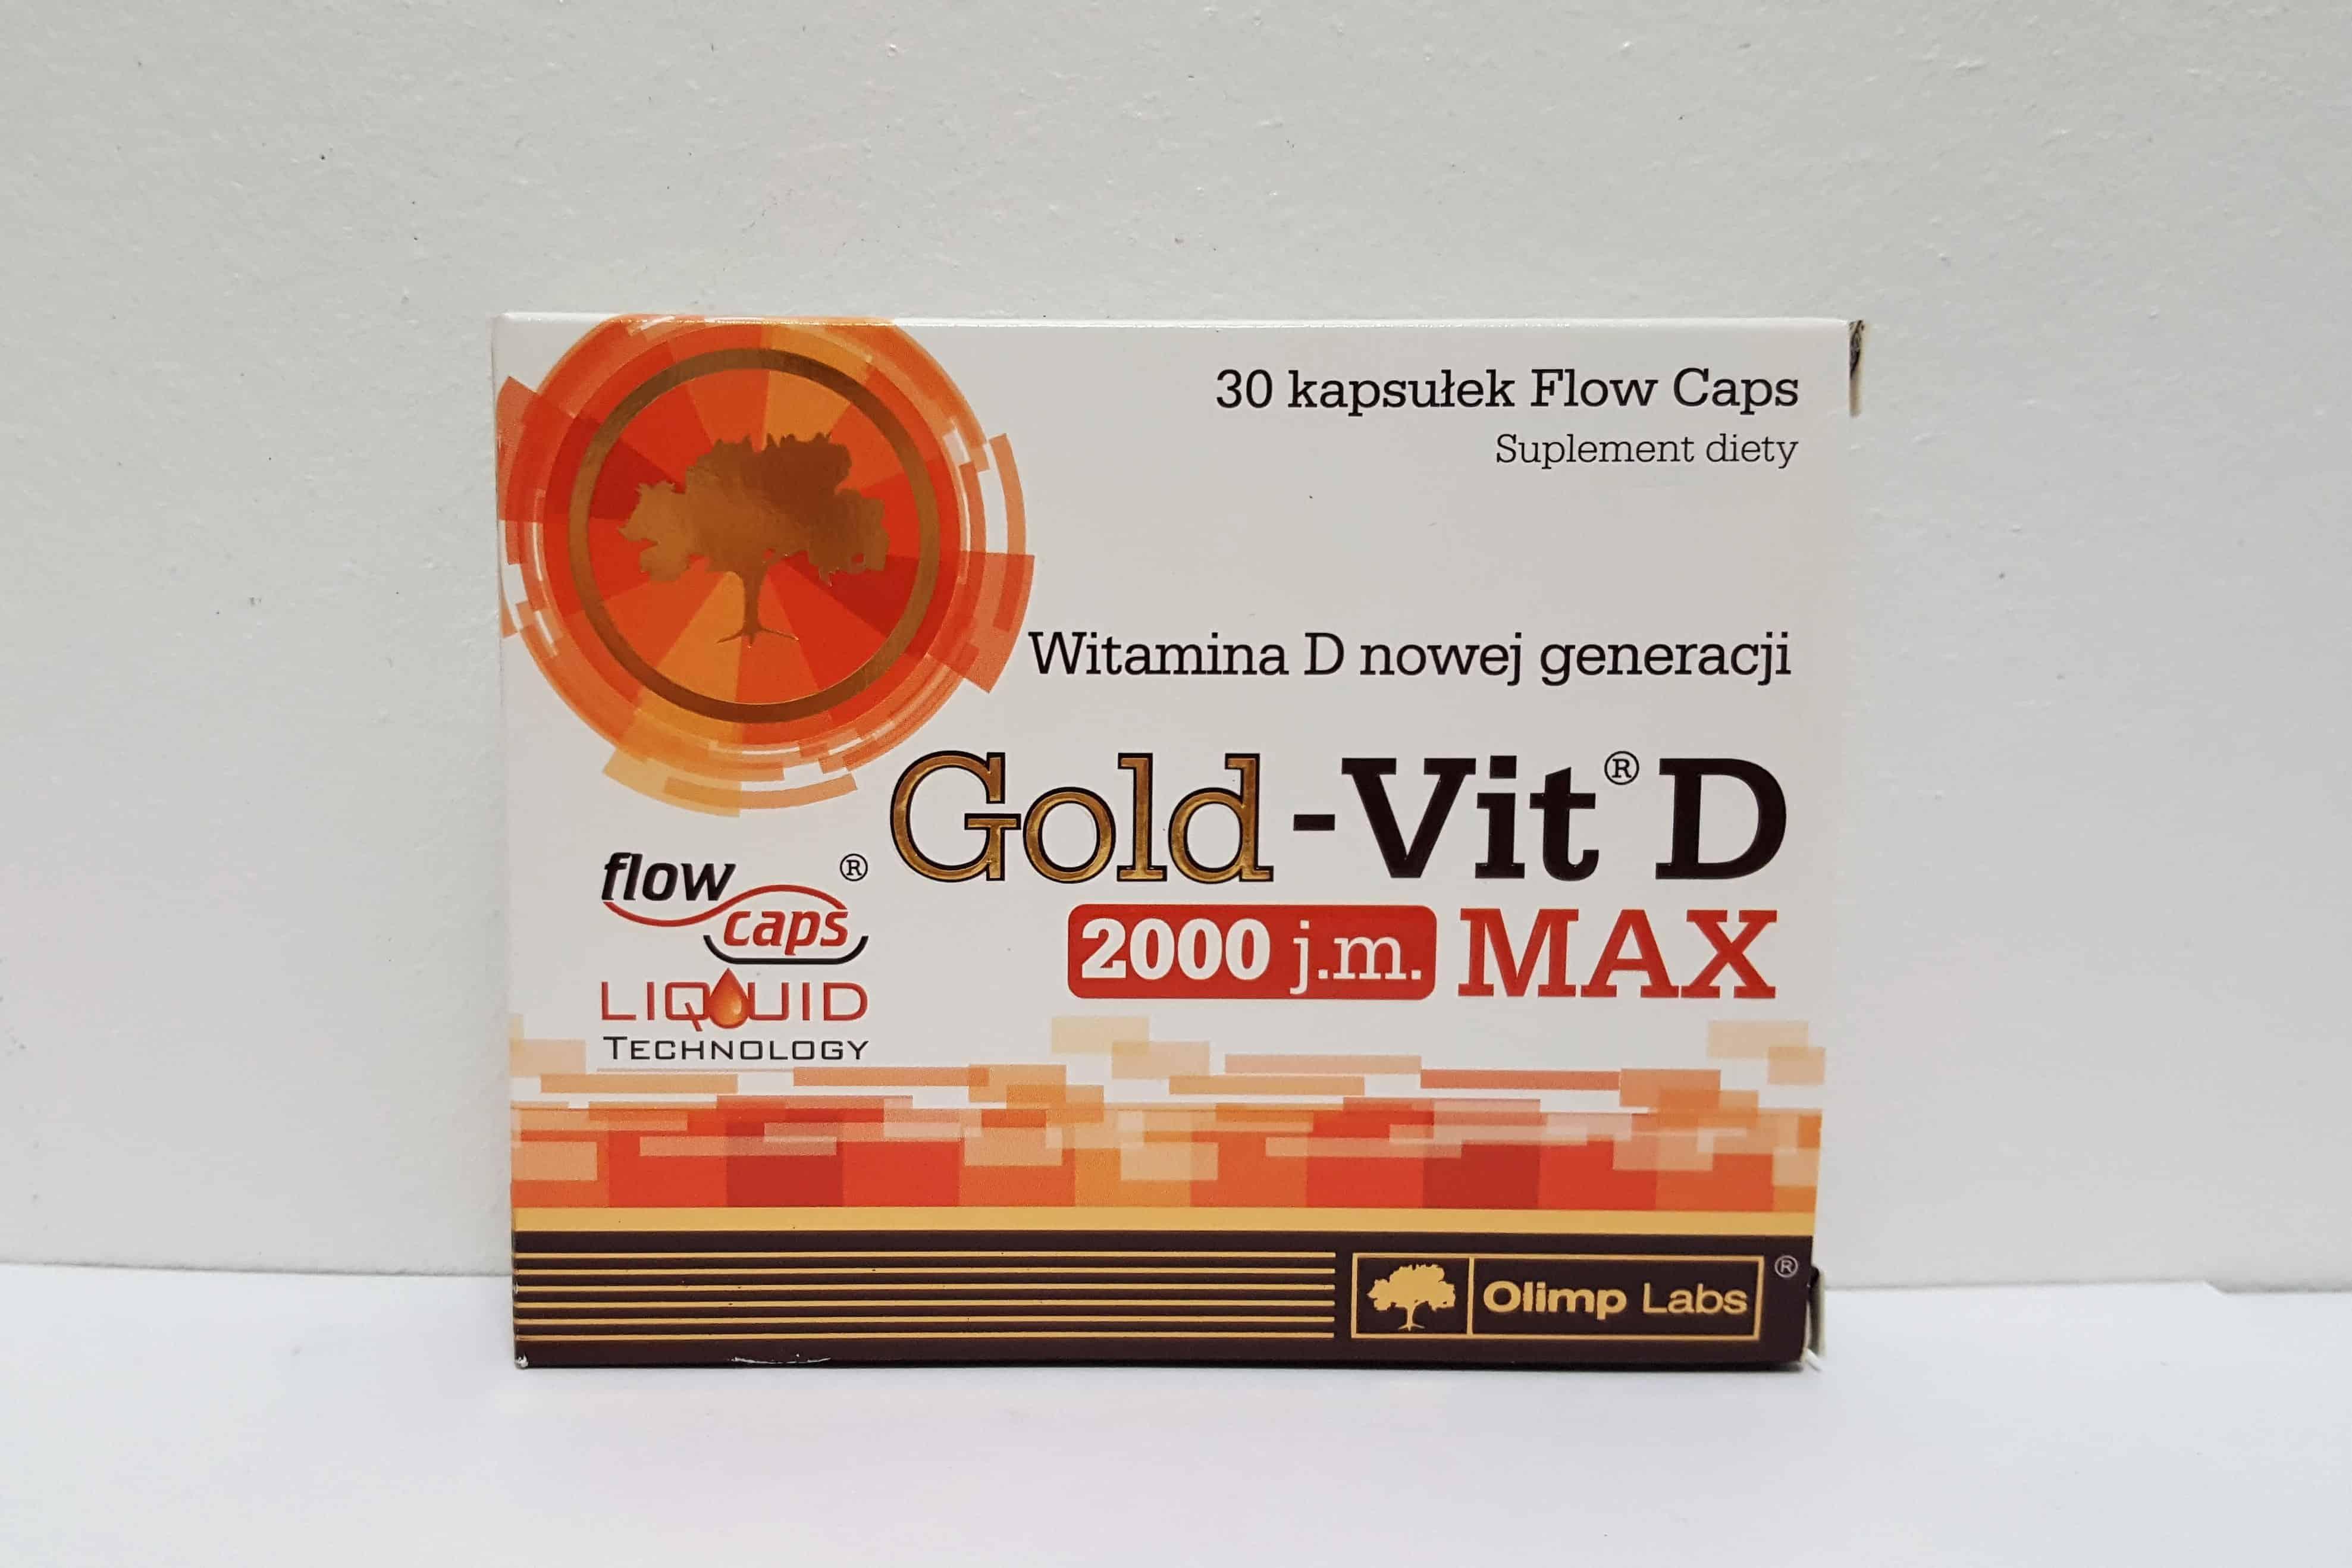 Olimp Gold-Vit D Max2000 j.m. Matka Aptekarka